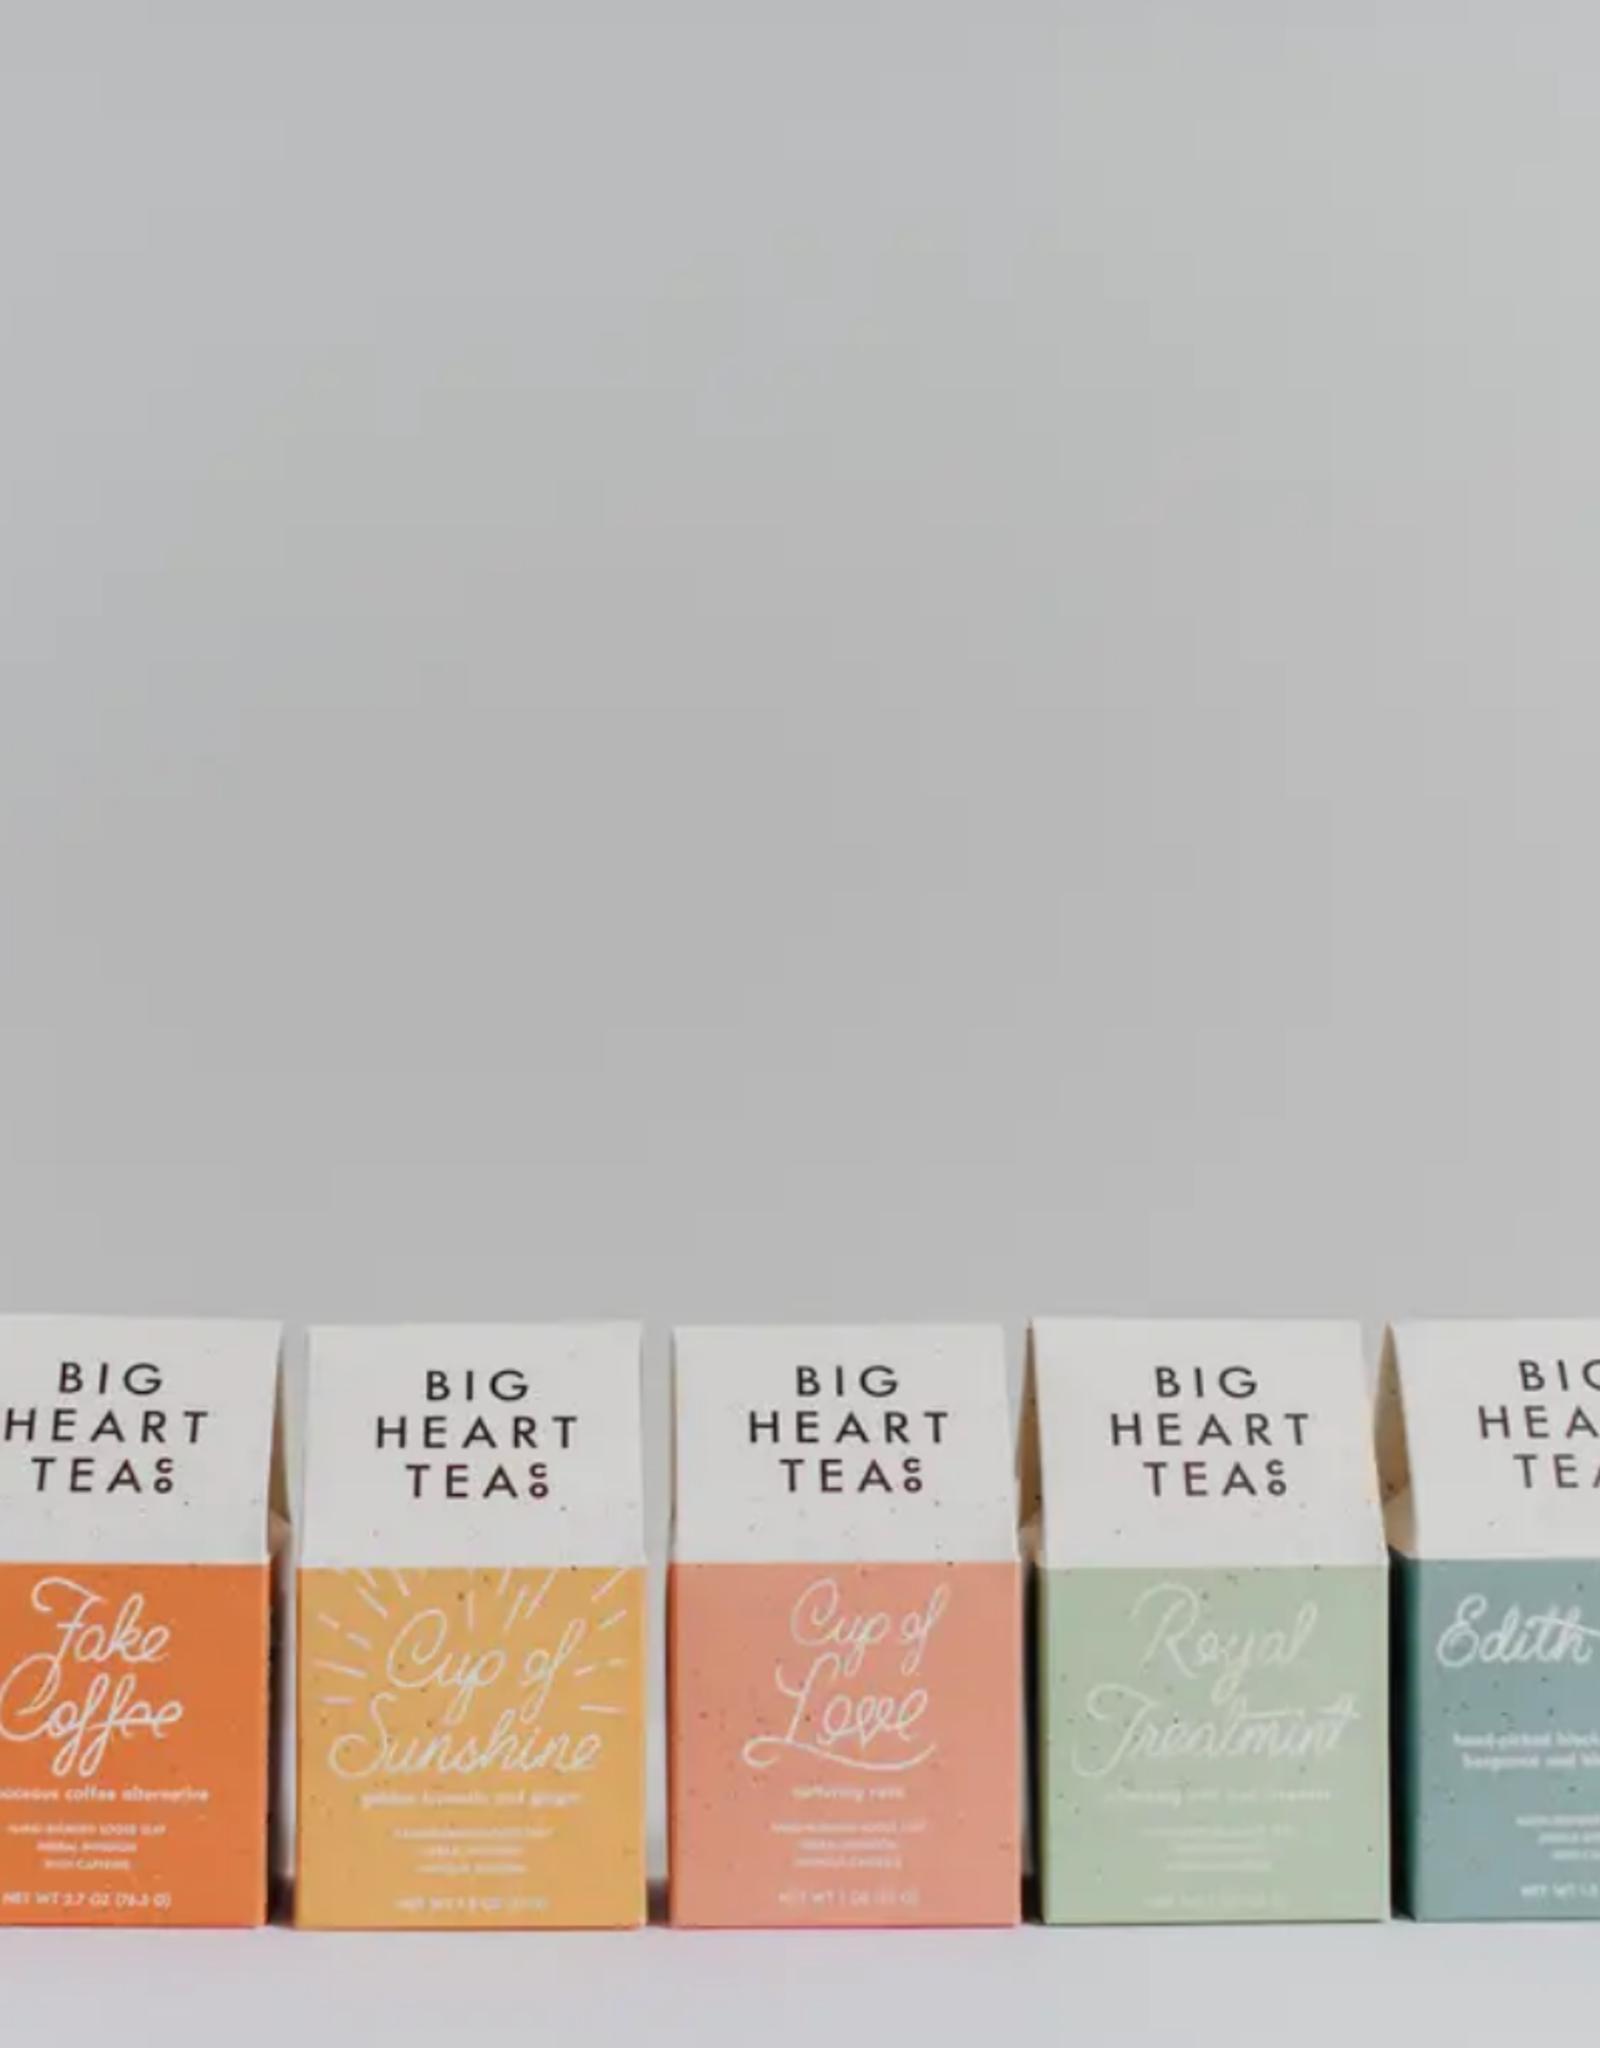 Big Heart Tea Co. Big Heart Tea Co. | Loose Leaf Tea and Tea Bags